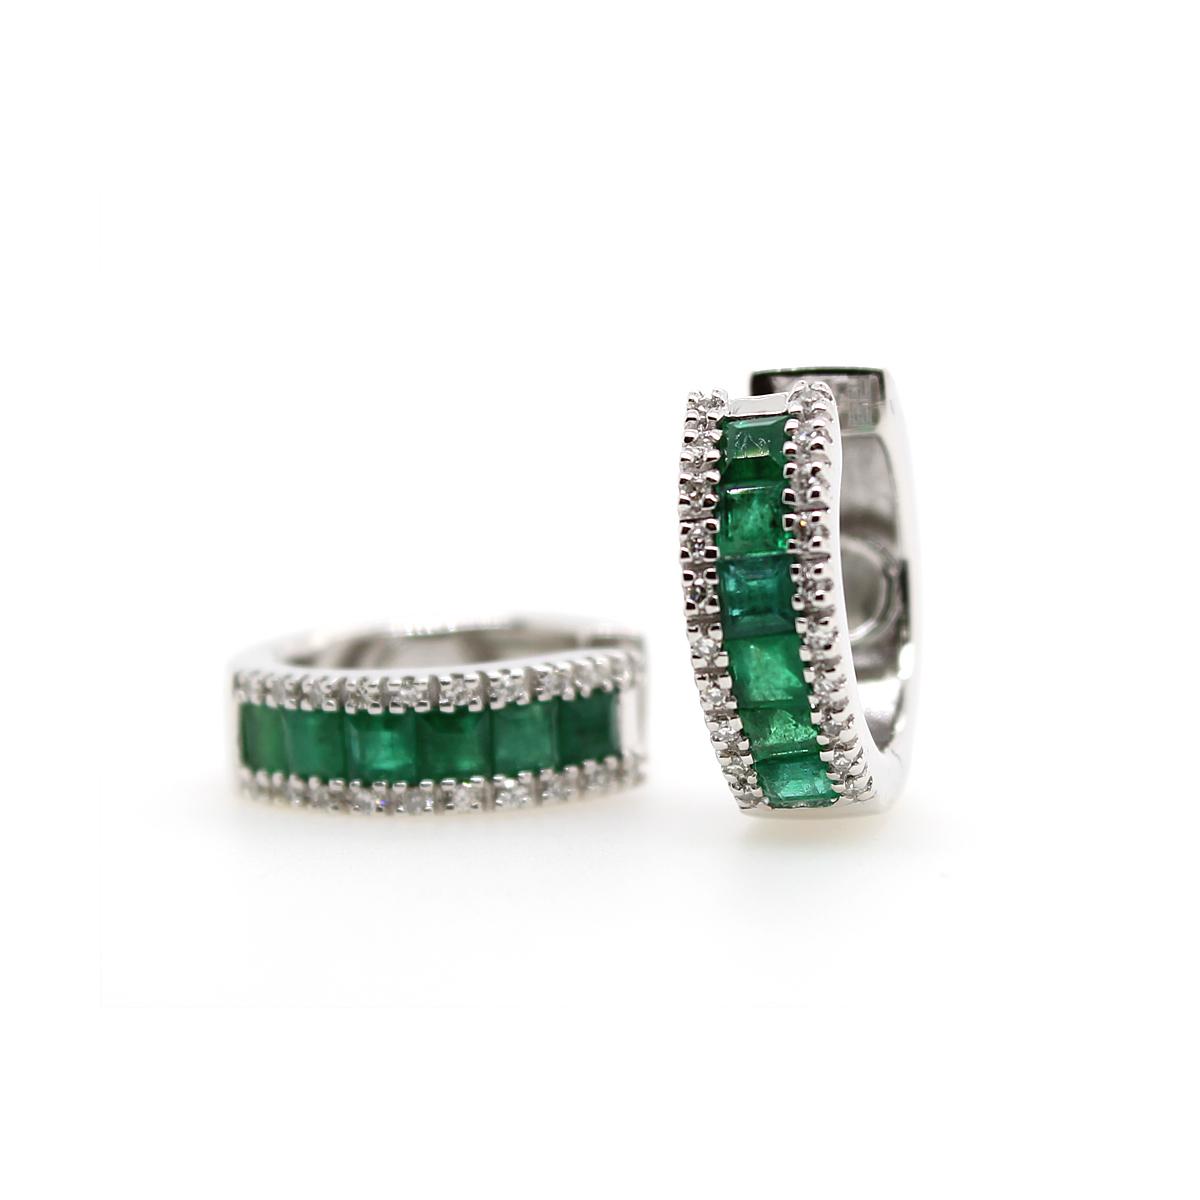 Vintage 14 Karat White Gold Emerald and Diamond Hinged Huggie Earrings